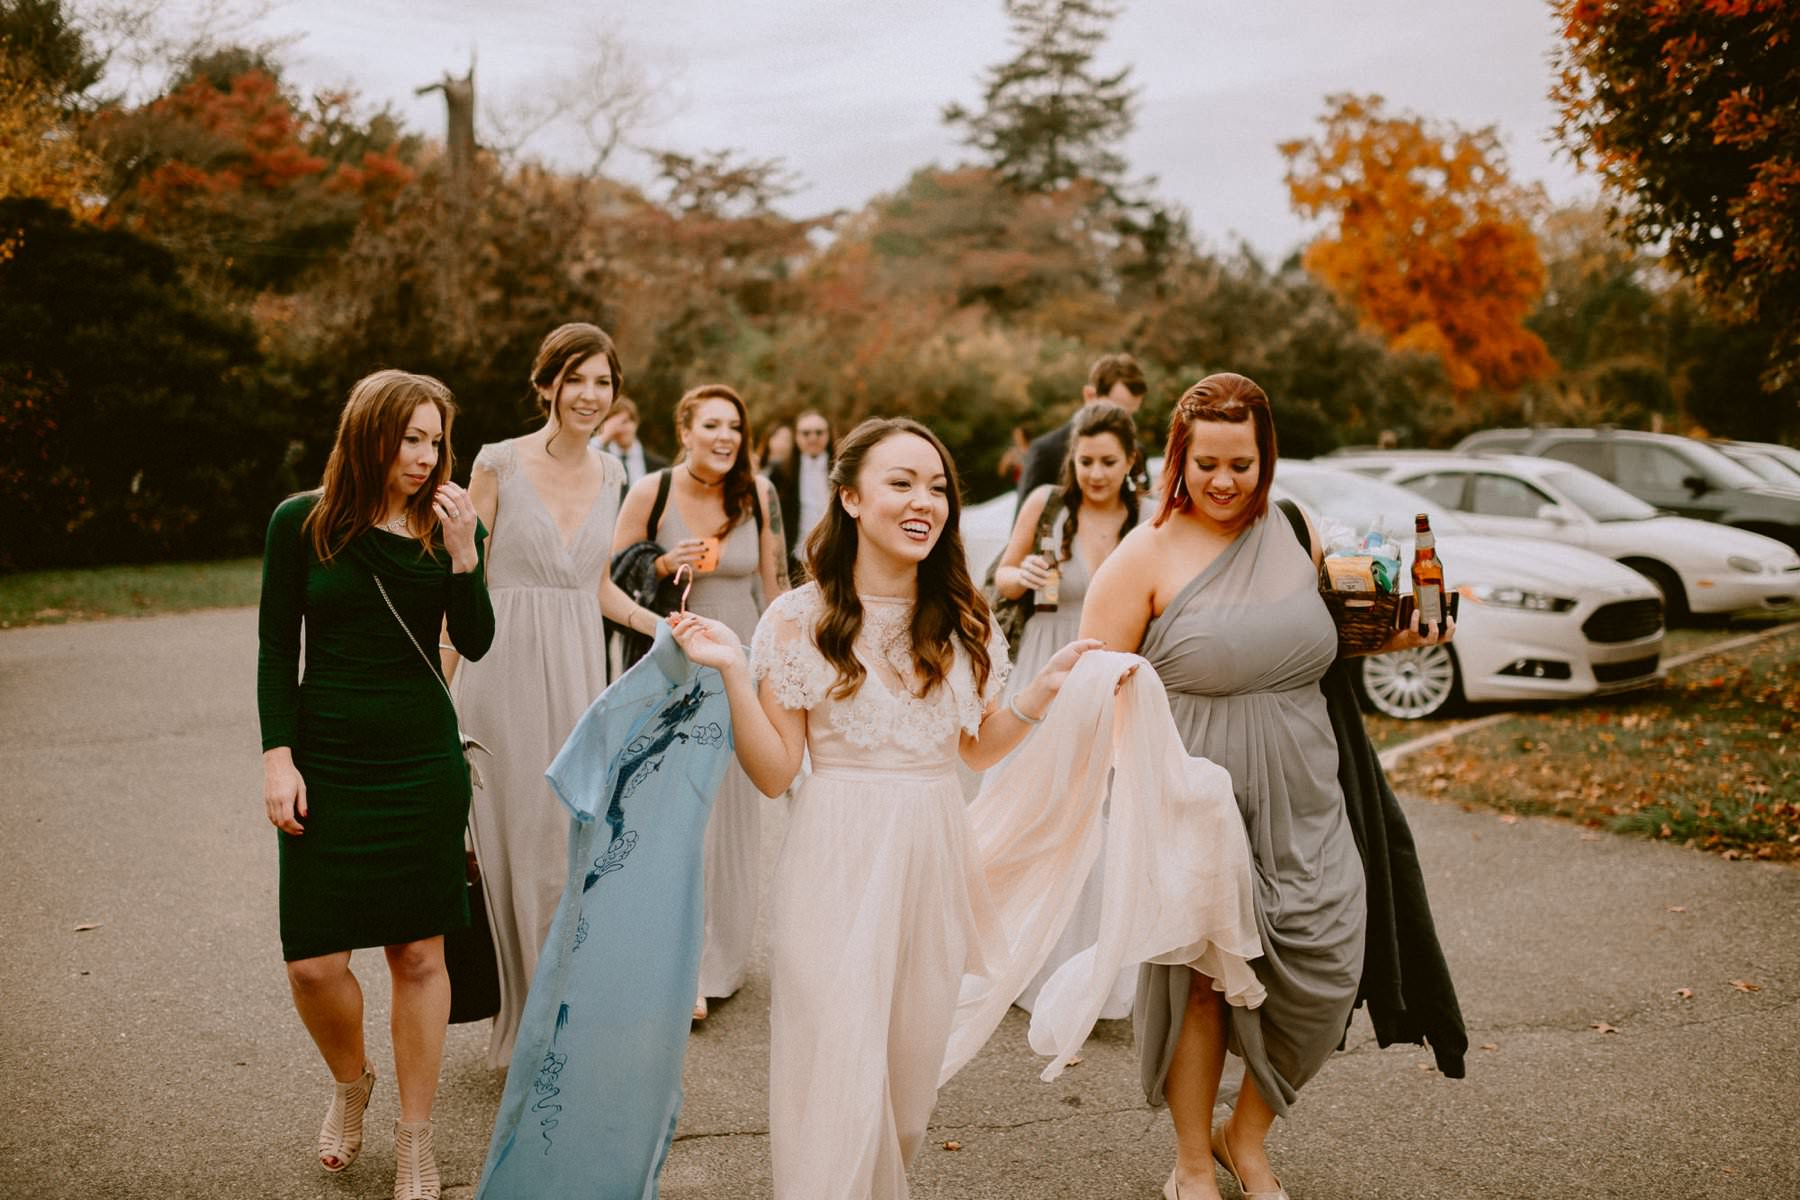 Tyler_arboretum_wedding-016.jpg